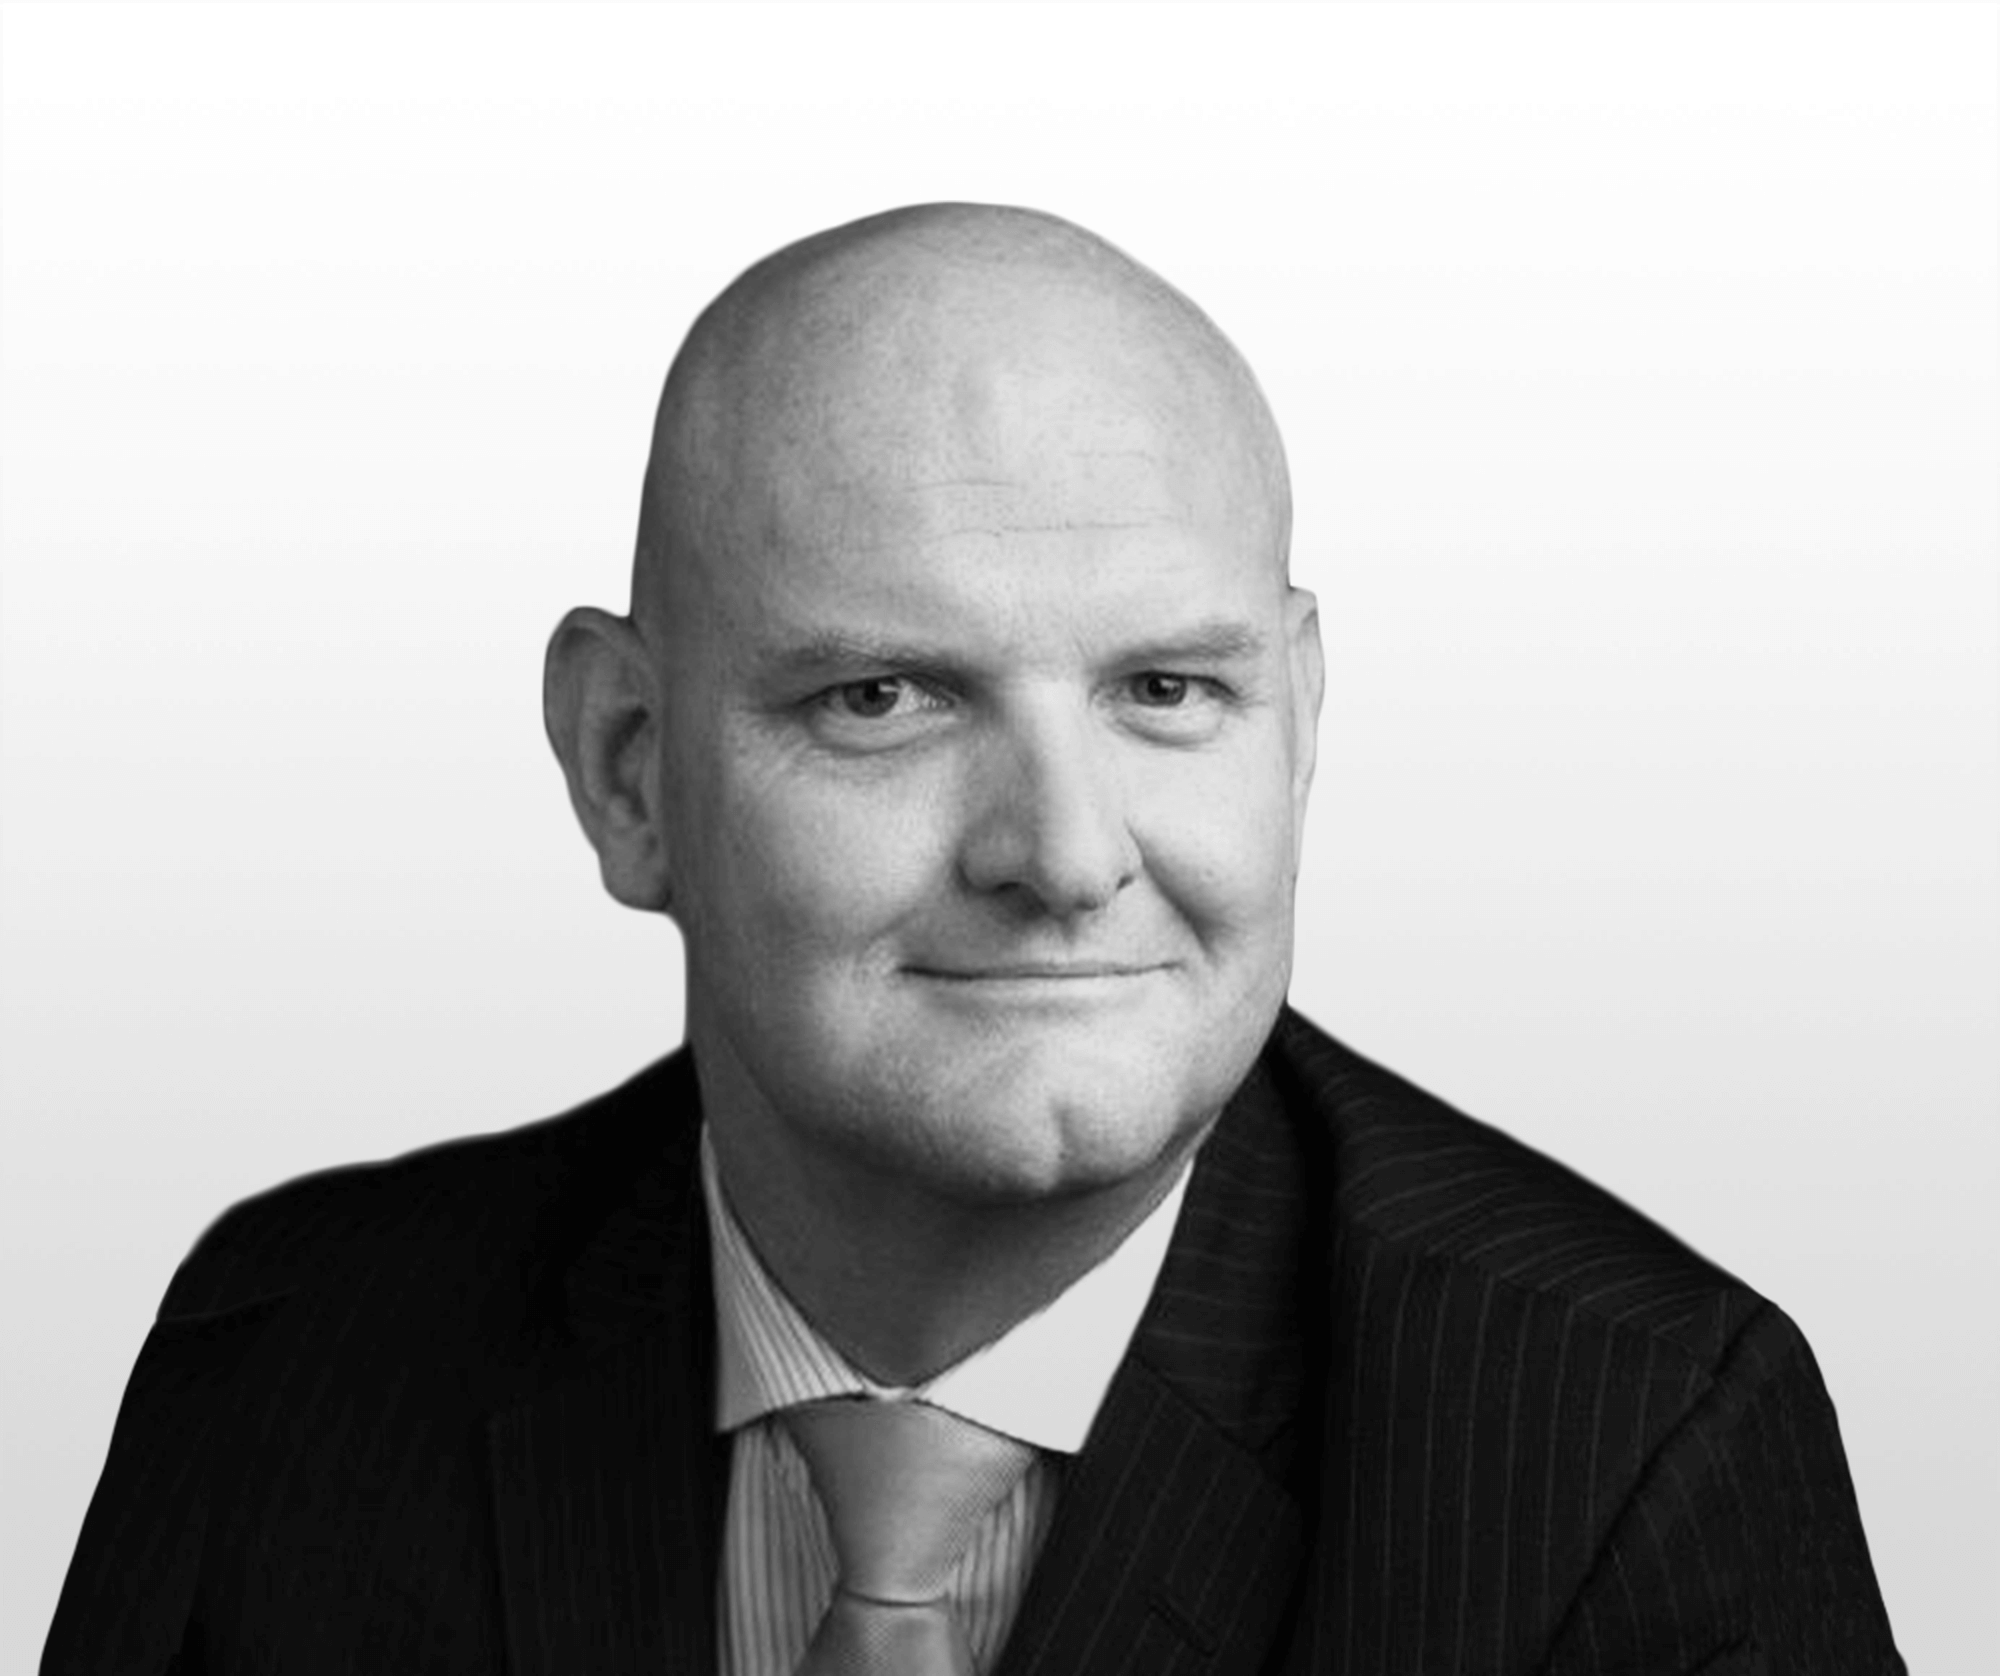 David Fairman